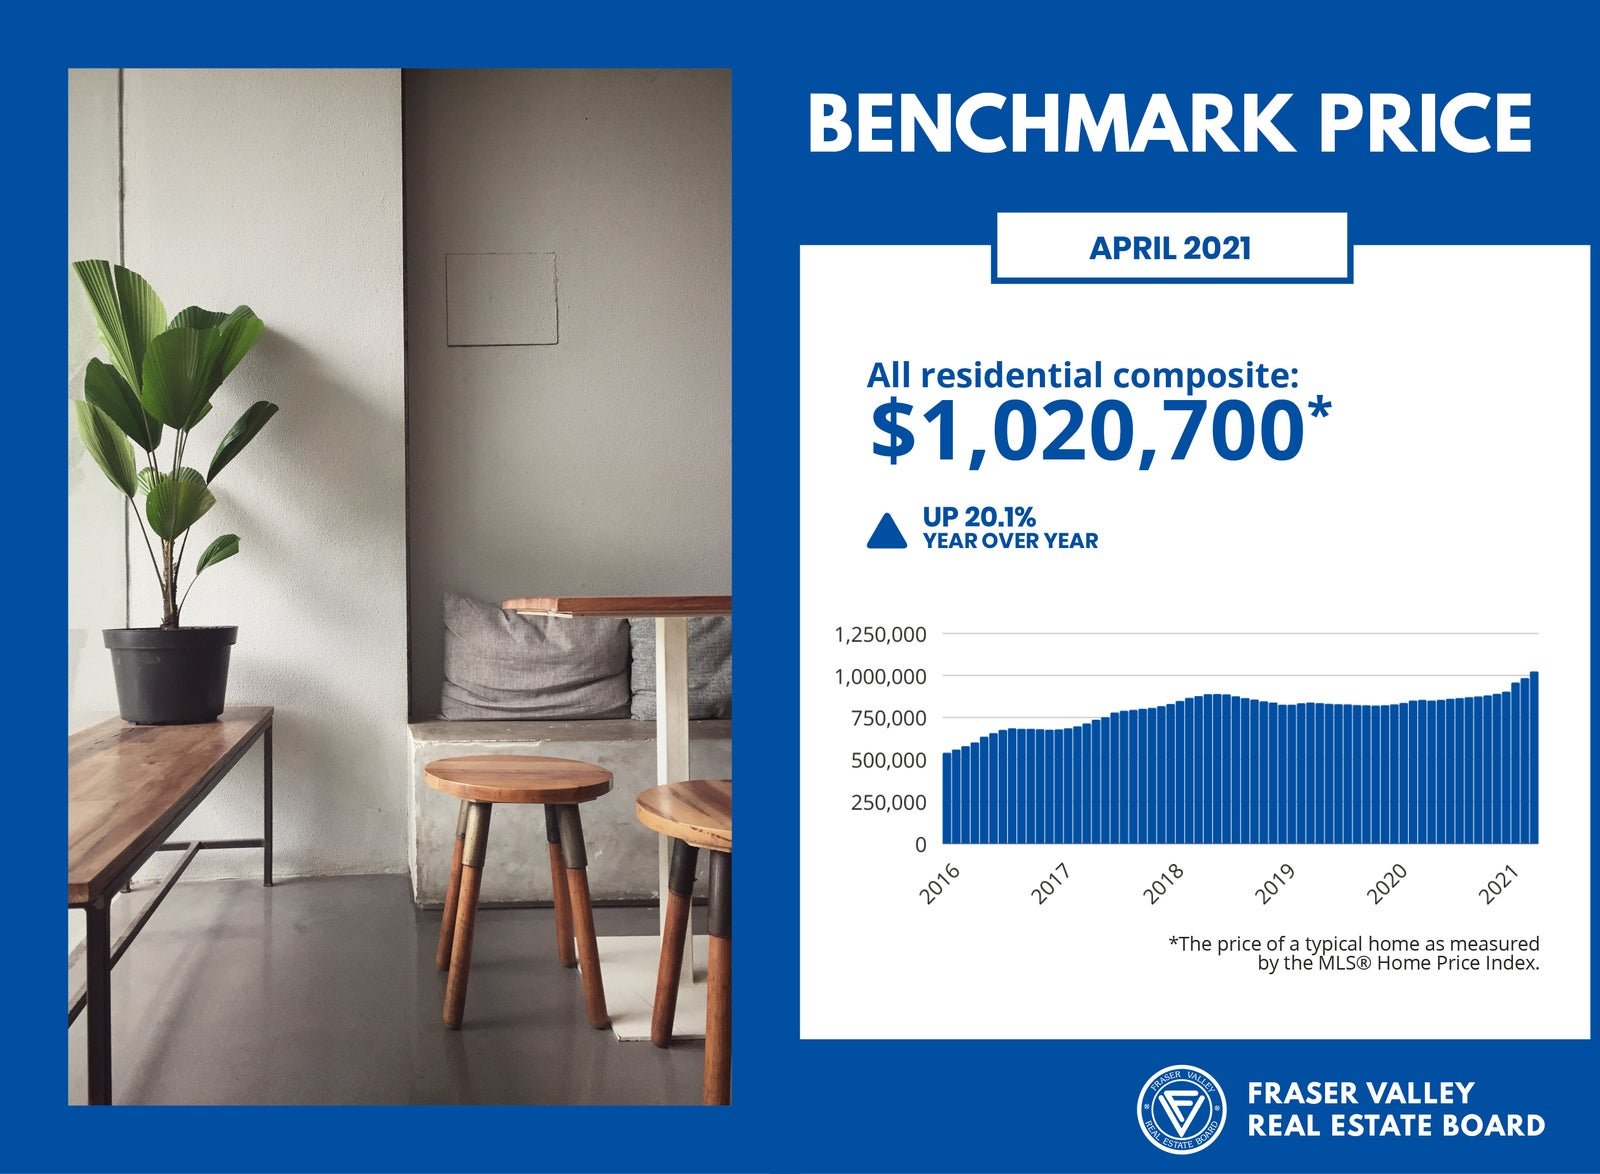 FVREB Housing Market - Benchmark Price April 2021